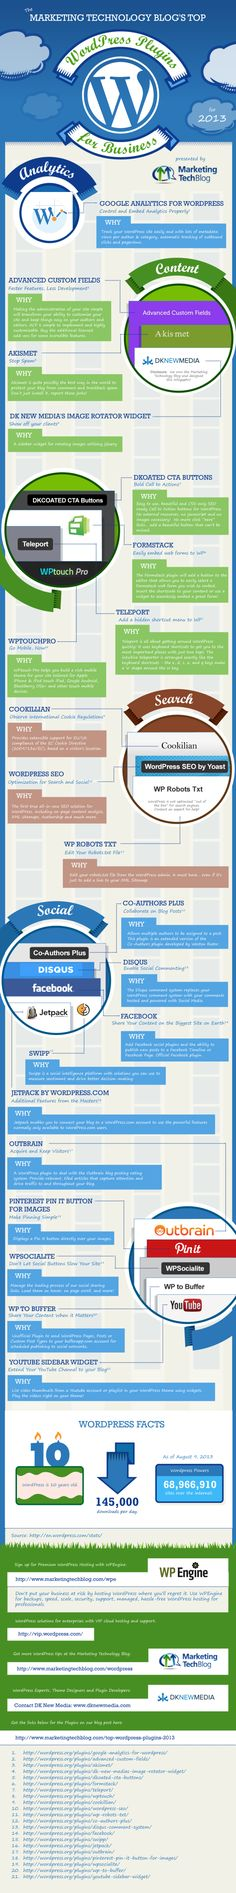 Los 21 mejores plugins para Wordpress 2013 #infografia #infographic #socialmedia